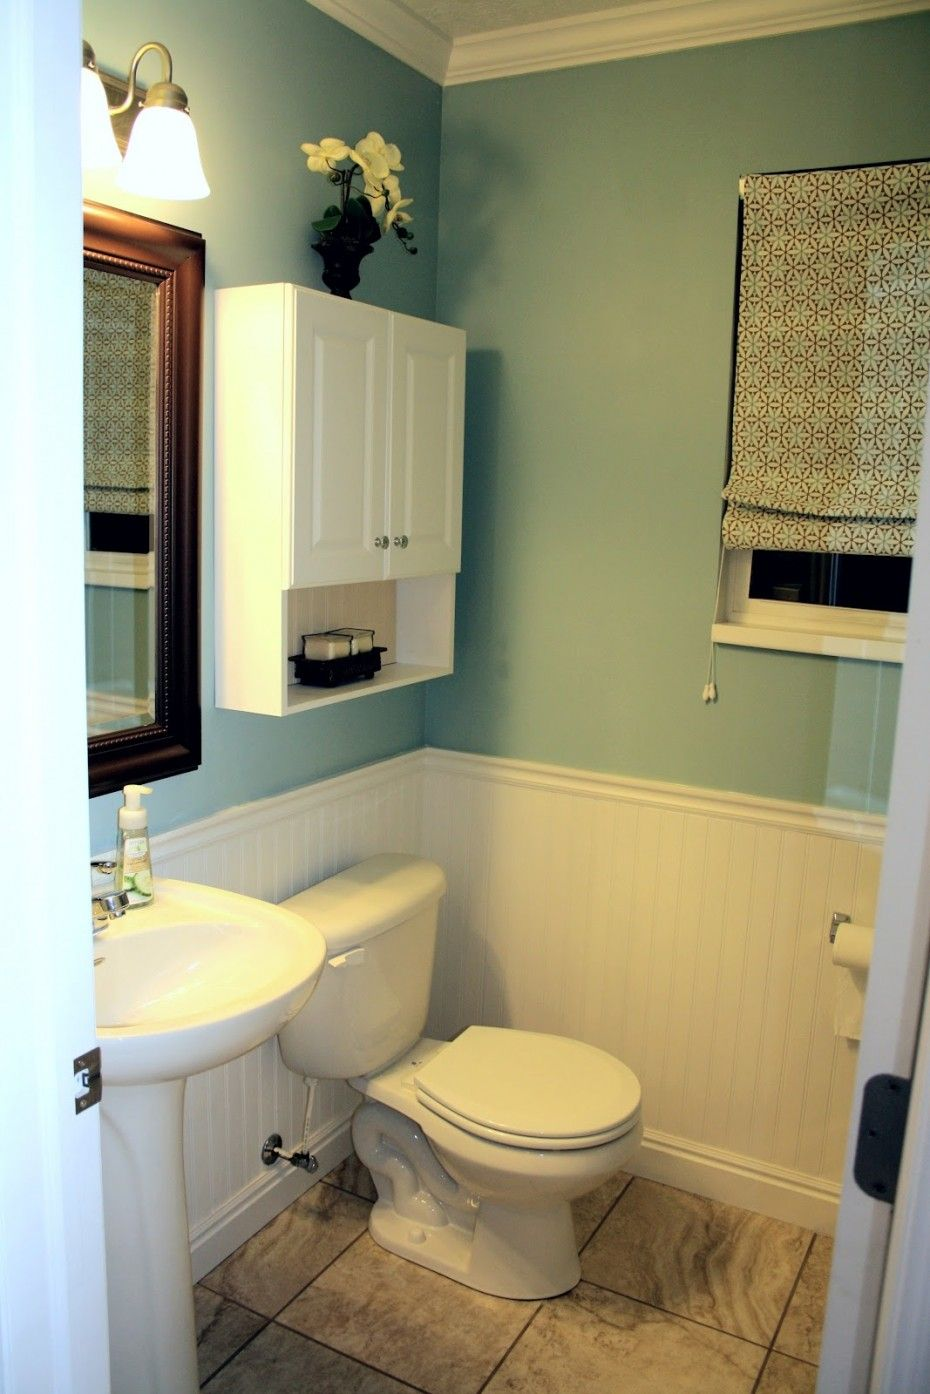 Bathroom Beadboard Bathroom In Firmones Pics Here Is An